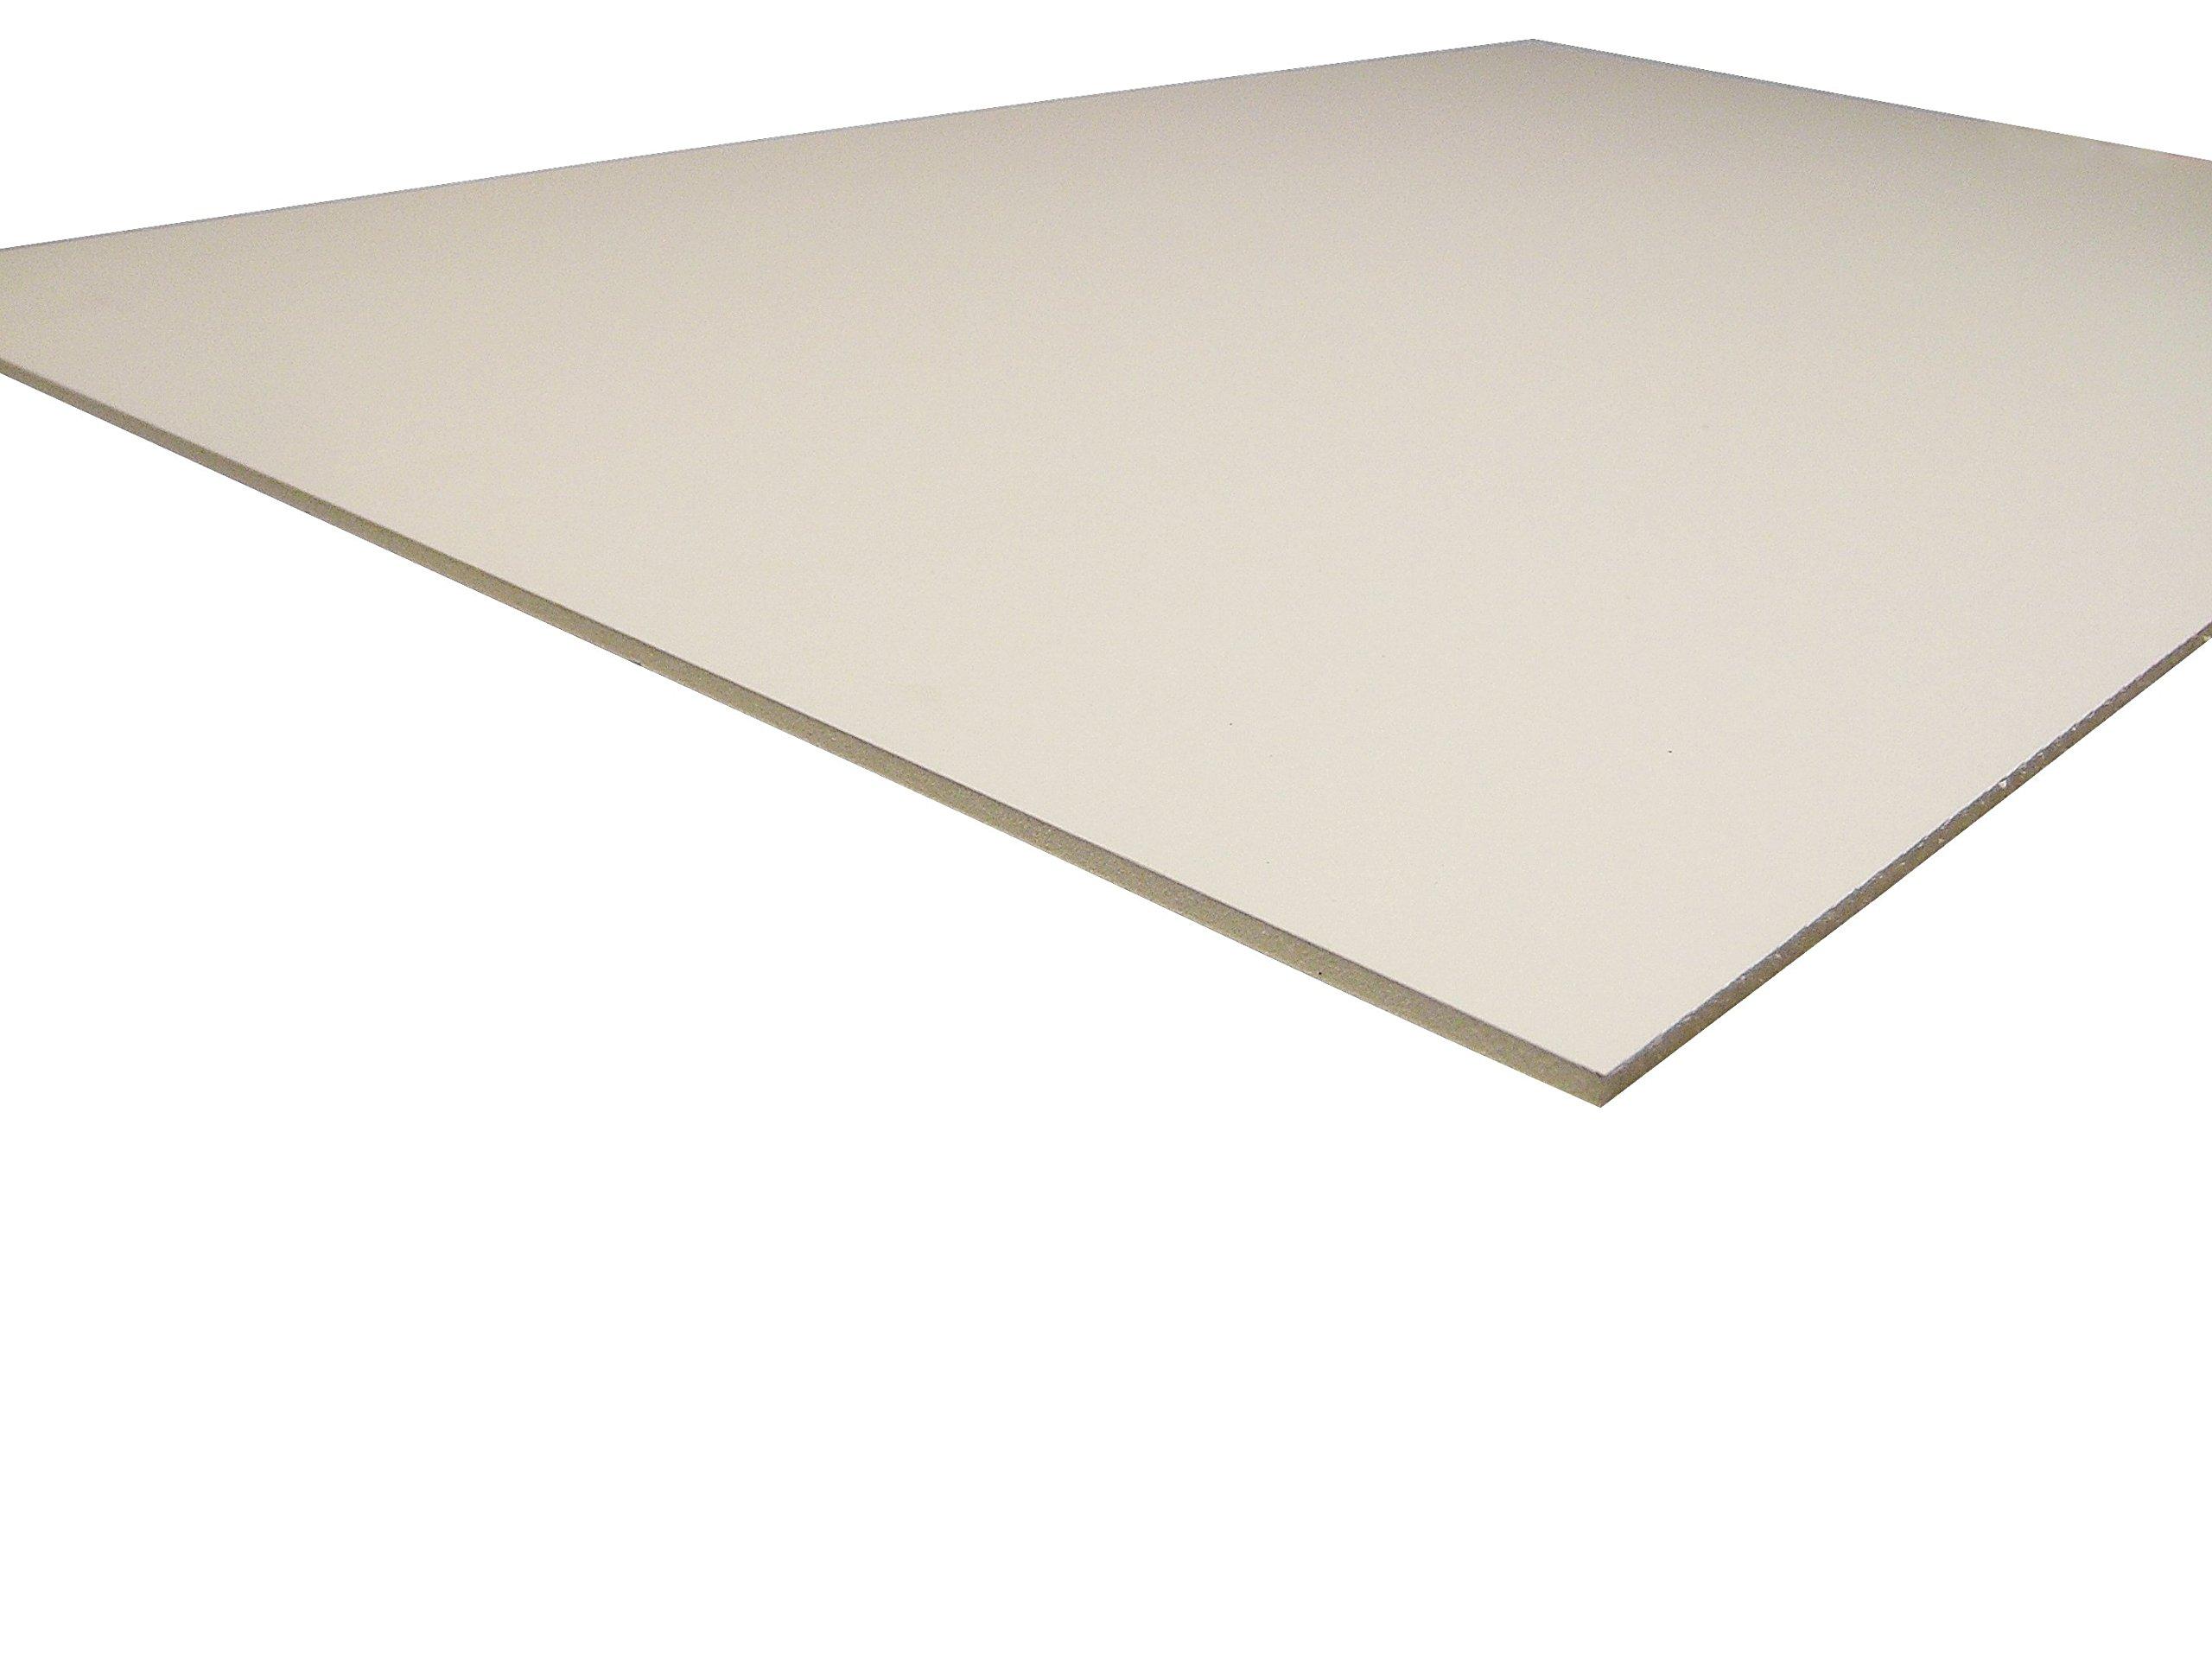 Gator Board - White 32''x40''x0.5'' (3) by Gator Board